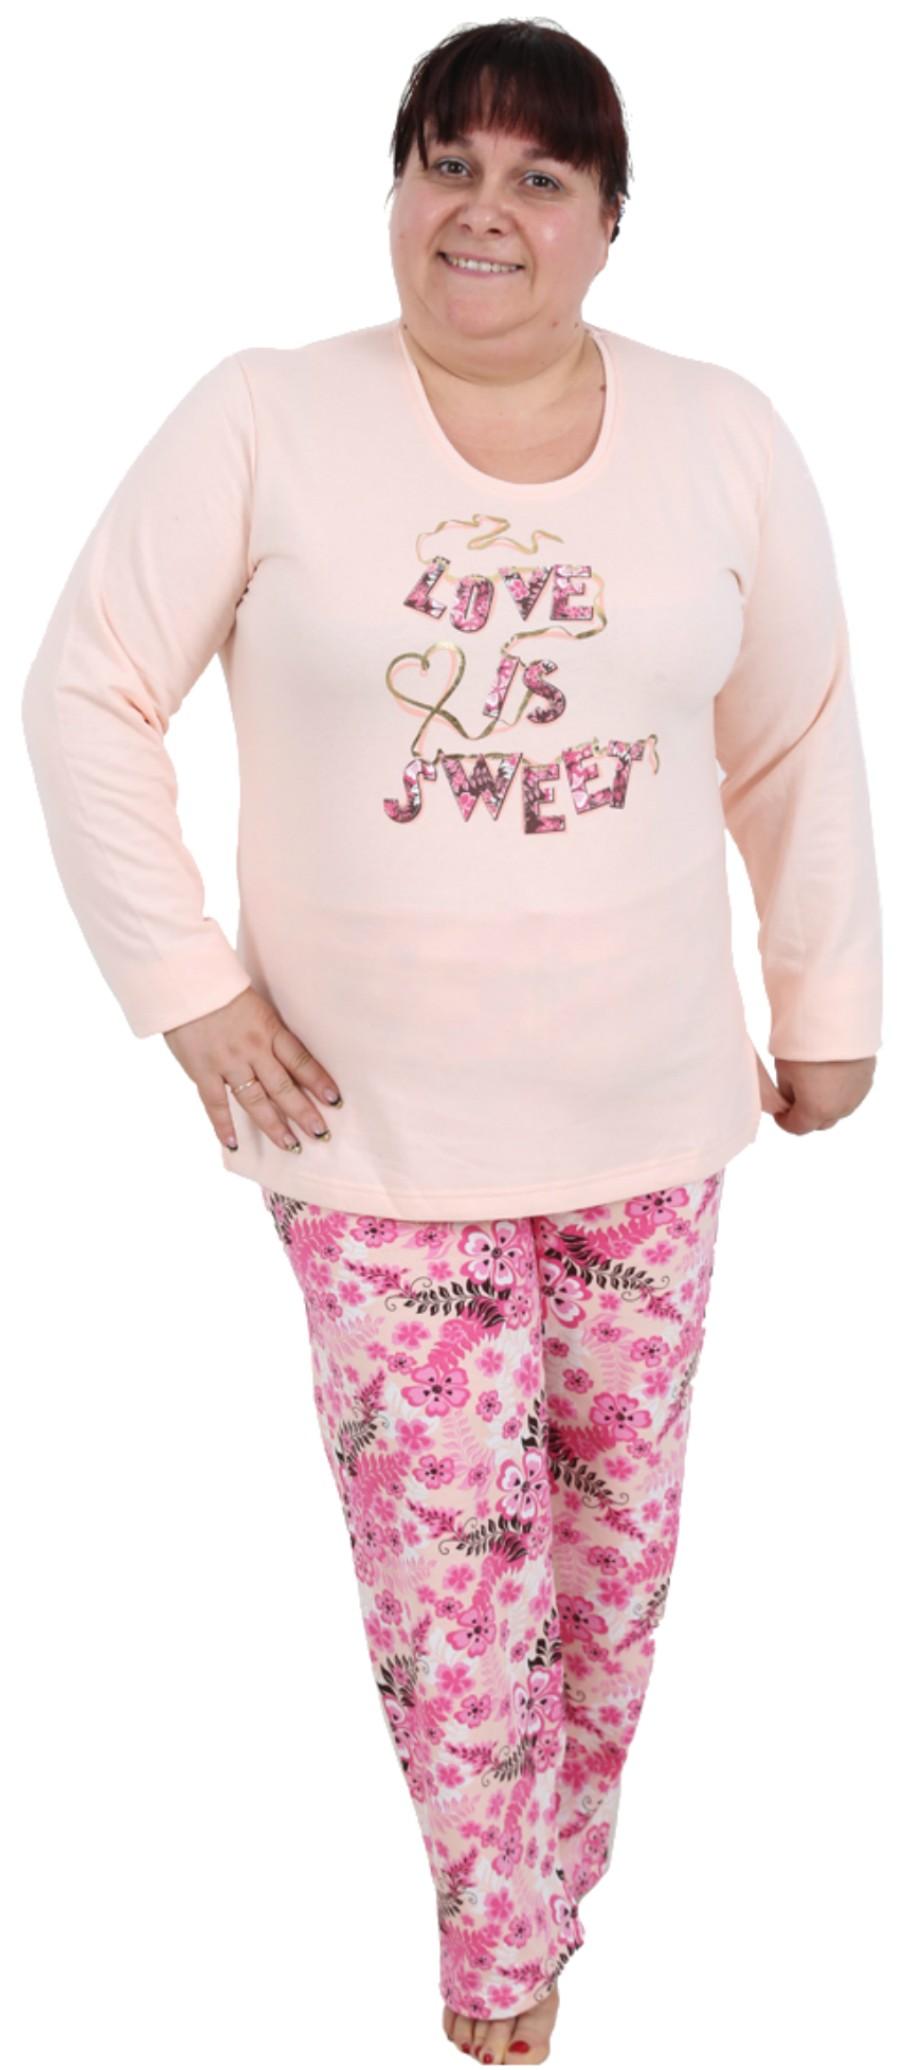 837c2e933c Pijama Talla Grande Perchado Felpa Largo Manga Larga Mujer Love Sweet -  Moda y Pijamas